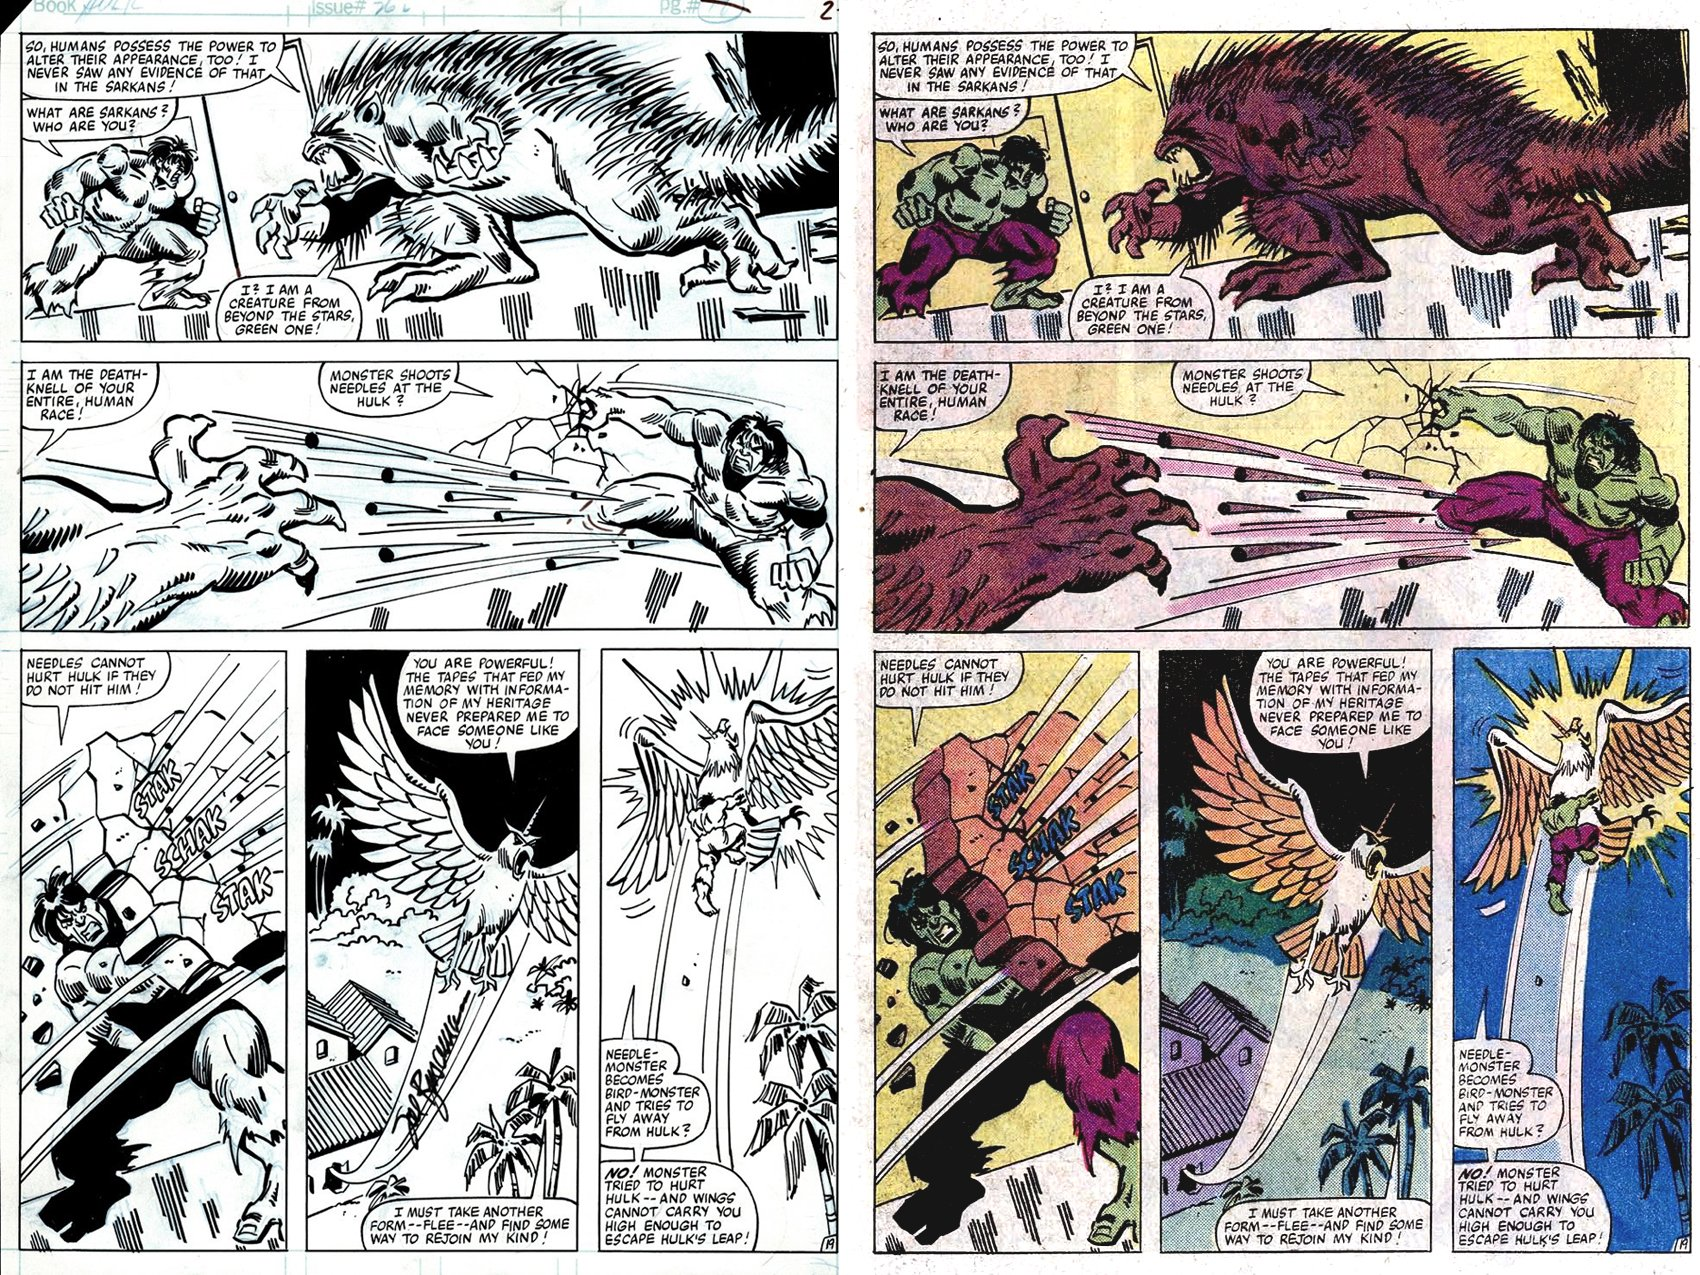 Incredible Hulk #262 p 19 (HULK'S VERY FIRST BATTLE WITH 'ROM' DIRE WRAITH MONSTER: KATTAN-TU!) 1981